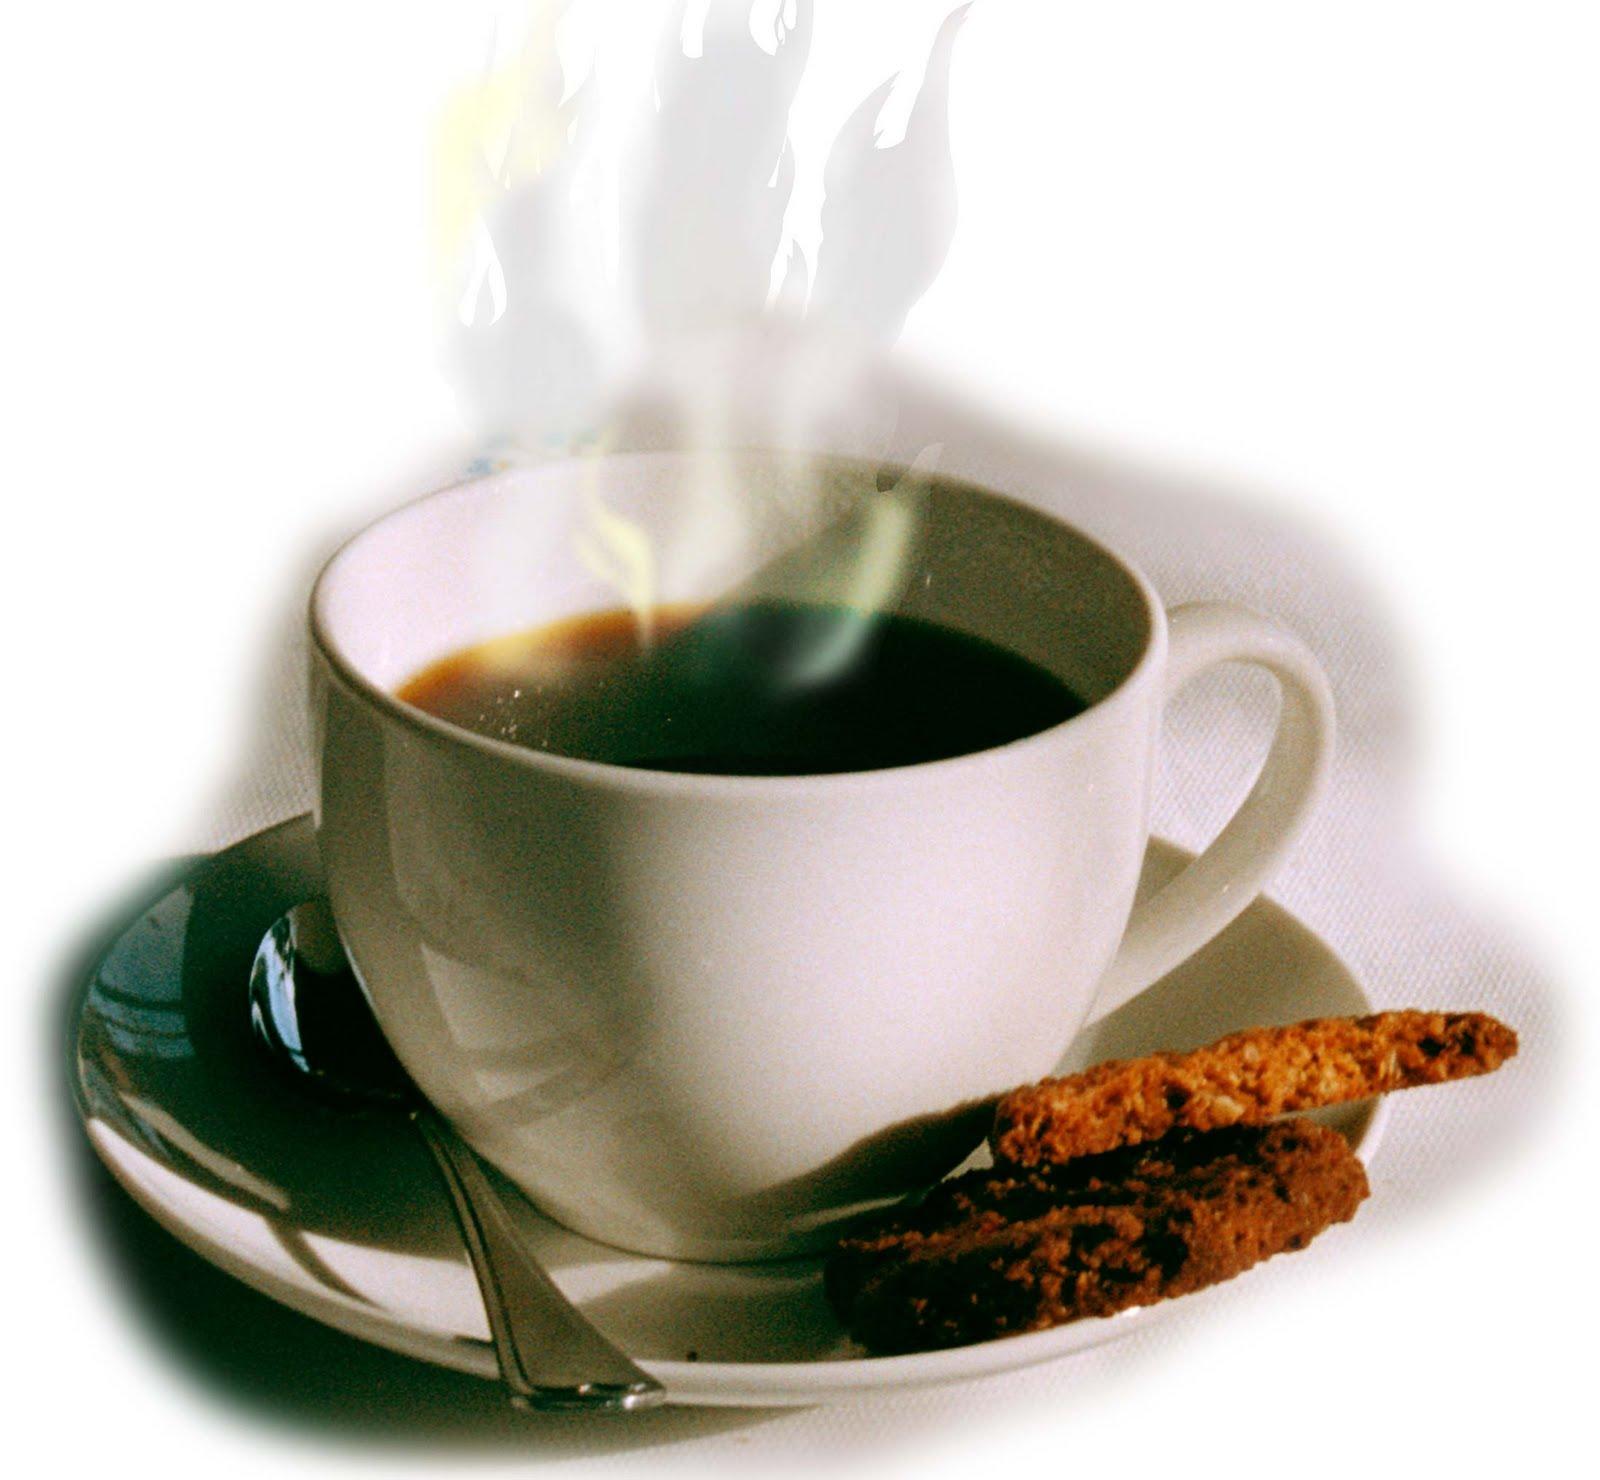 Gifs y Fondos Paz enla Tormenta ®: GIFS TAZA DE CAFÉ